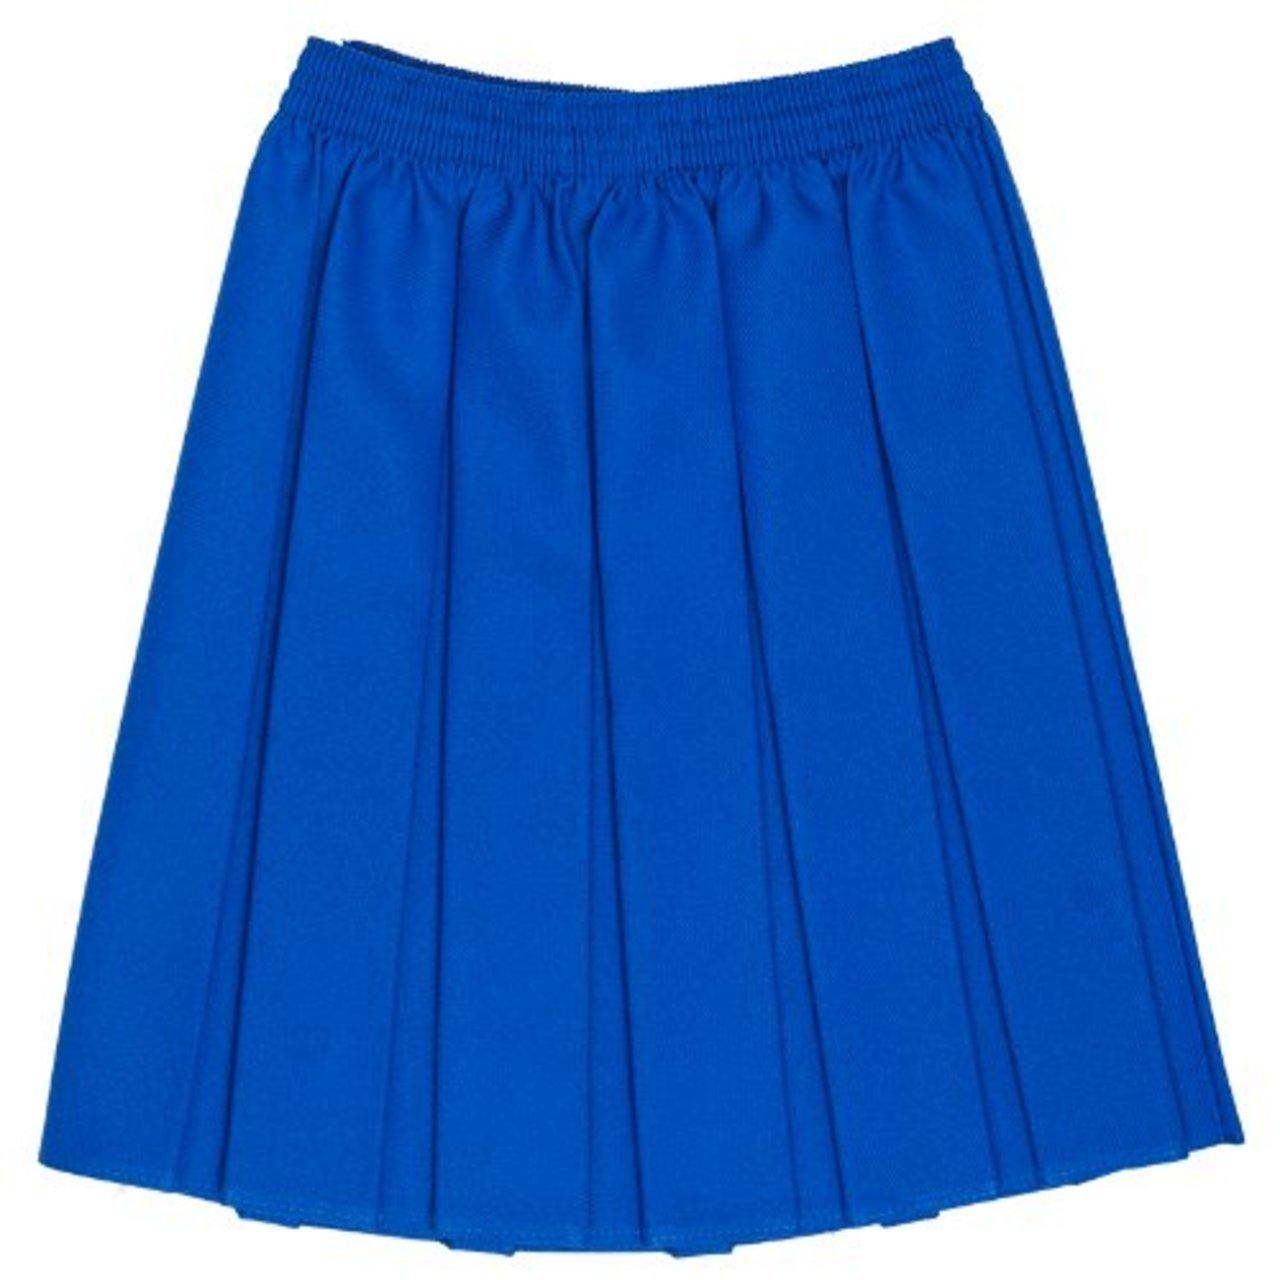 School Skirt Girls Box Pleat Uniform Sizes